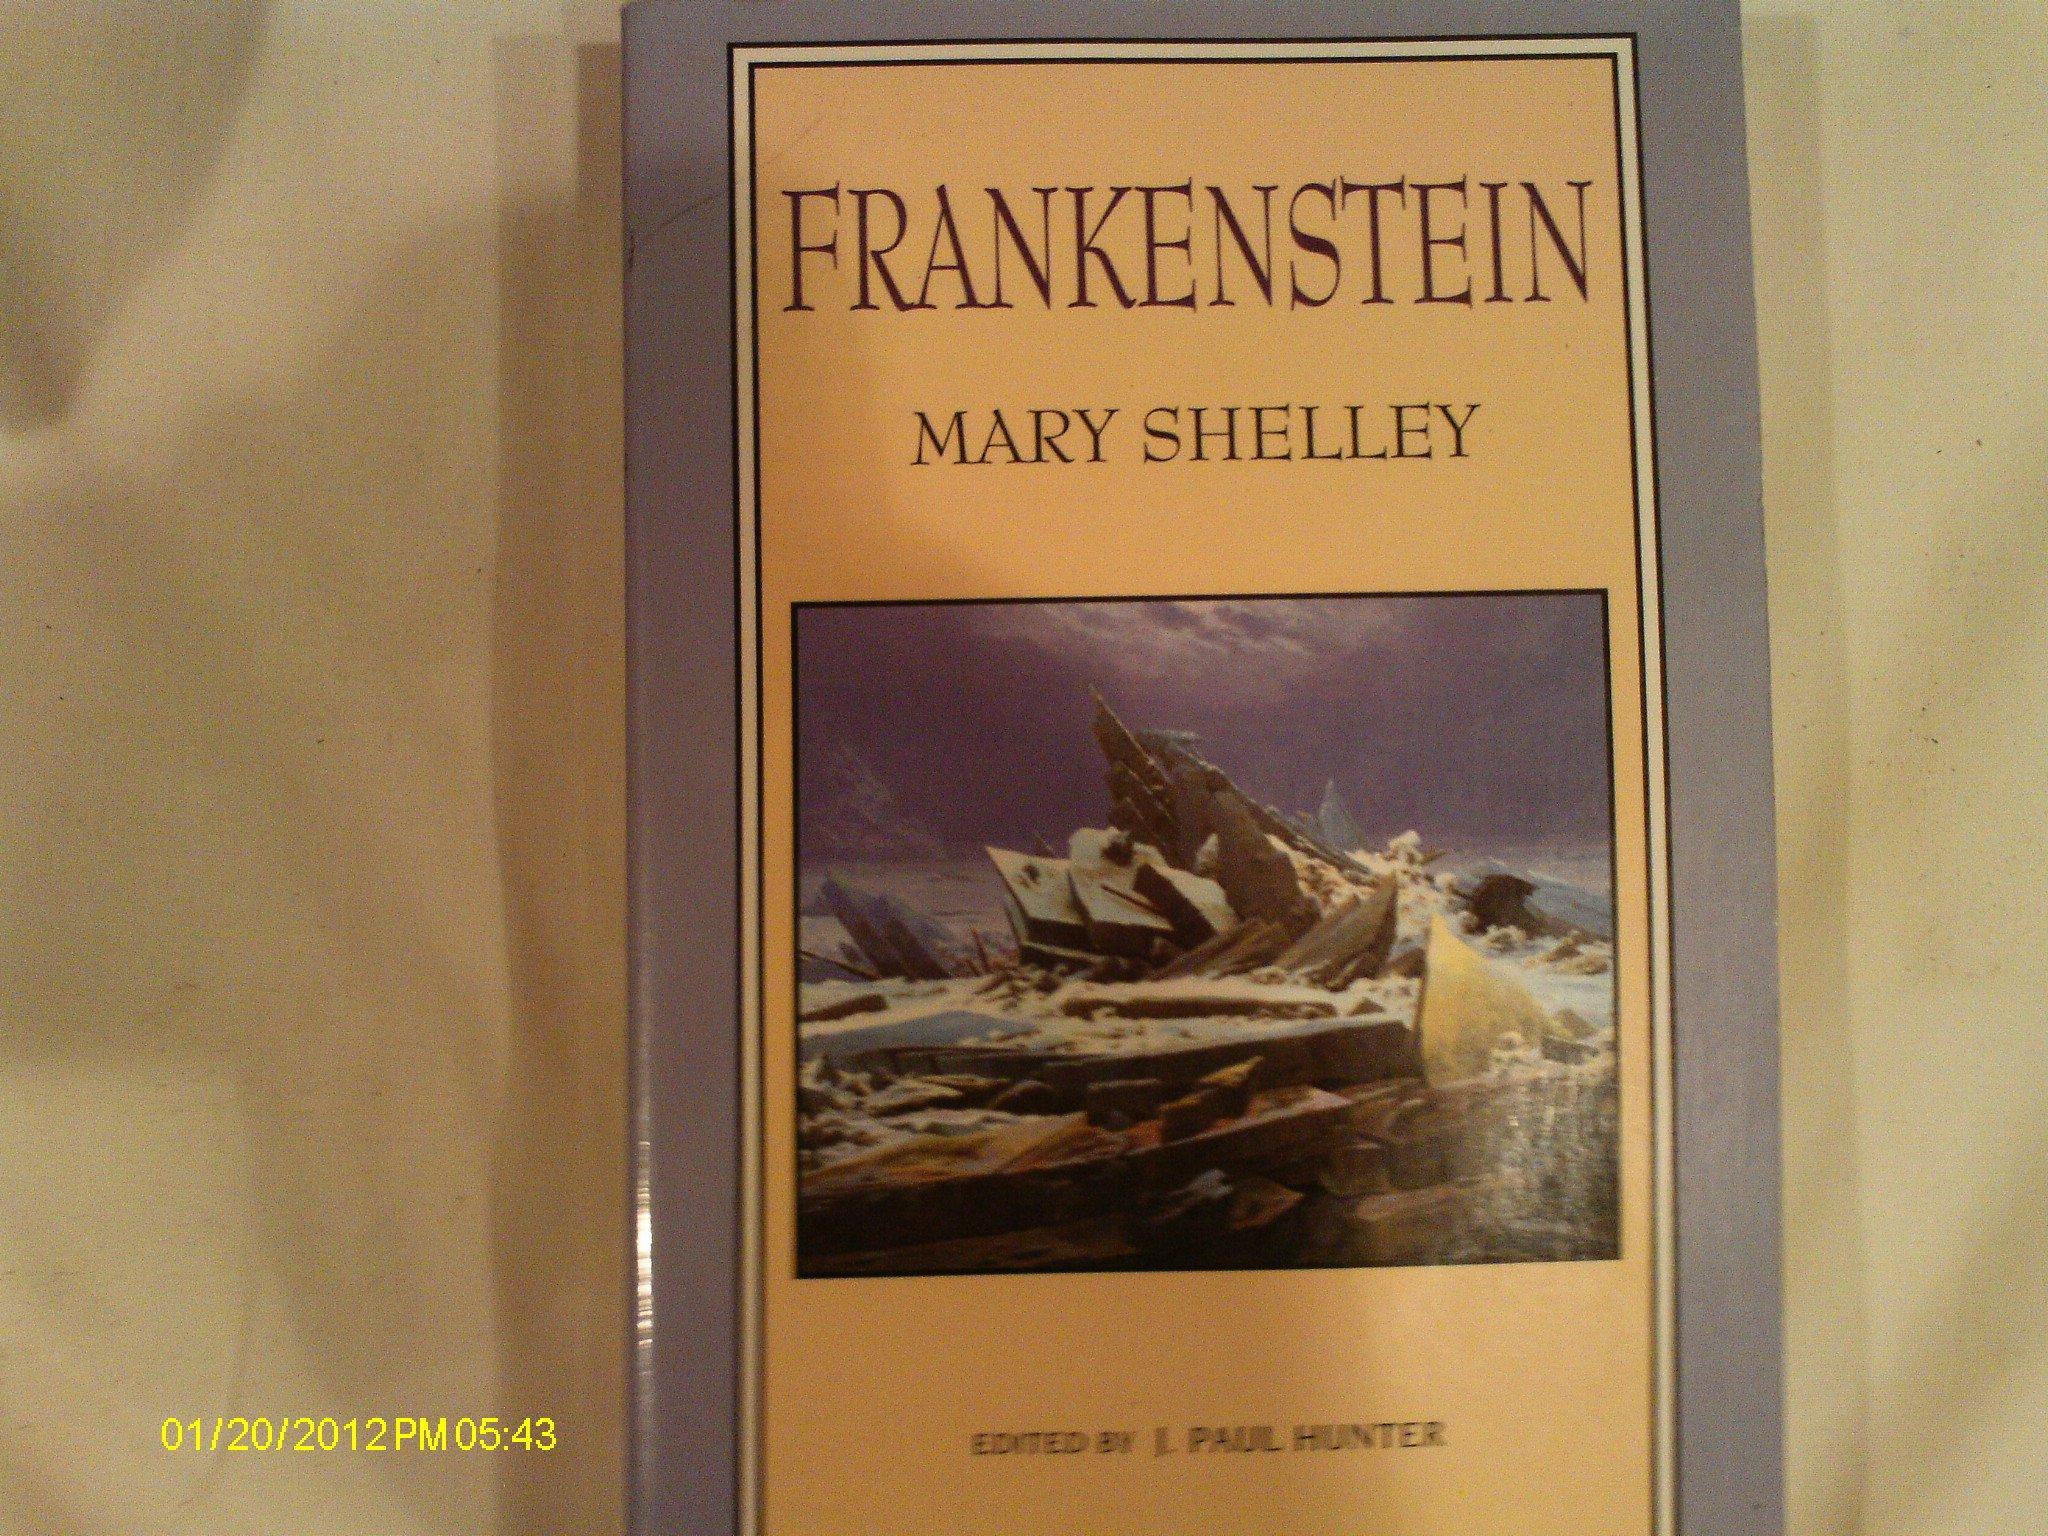 Frankenstein (Norton Critical Edition): Mary Wollstonecraft Shelley, J.  Paul Hunter: 9780393979381: Amazon.com: Books